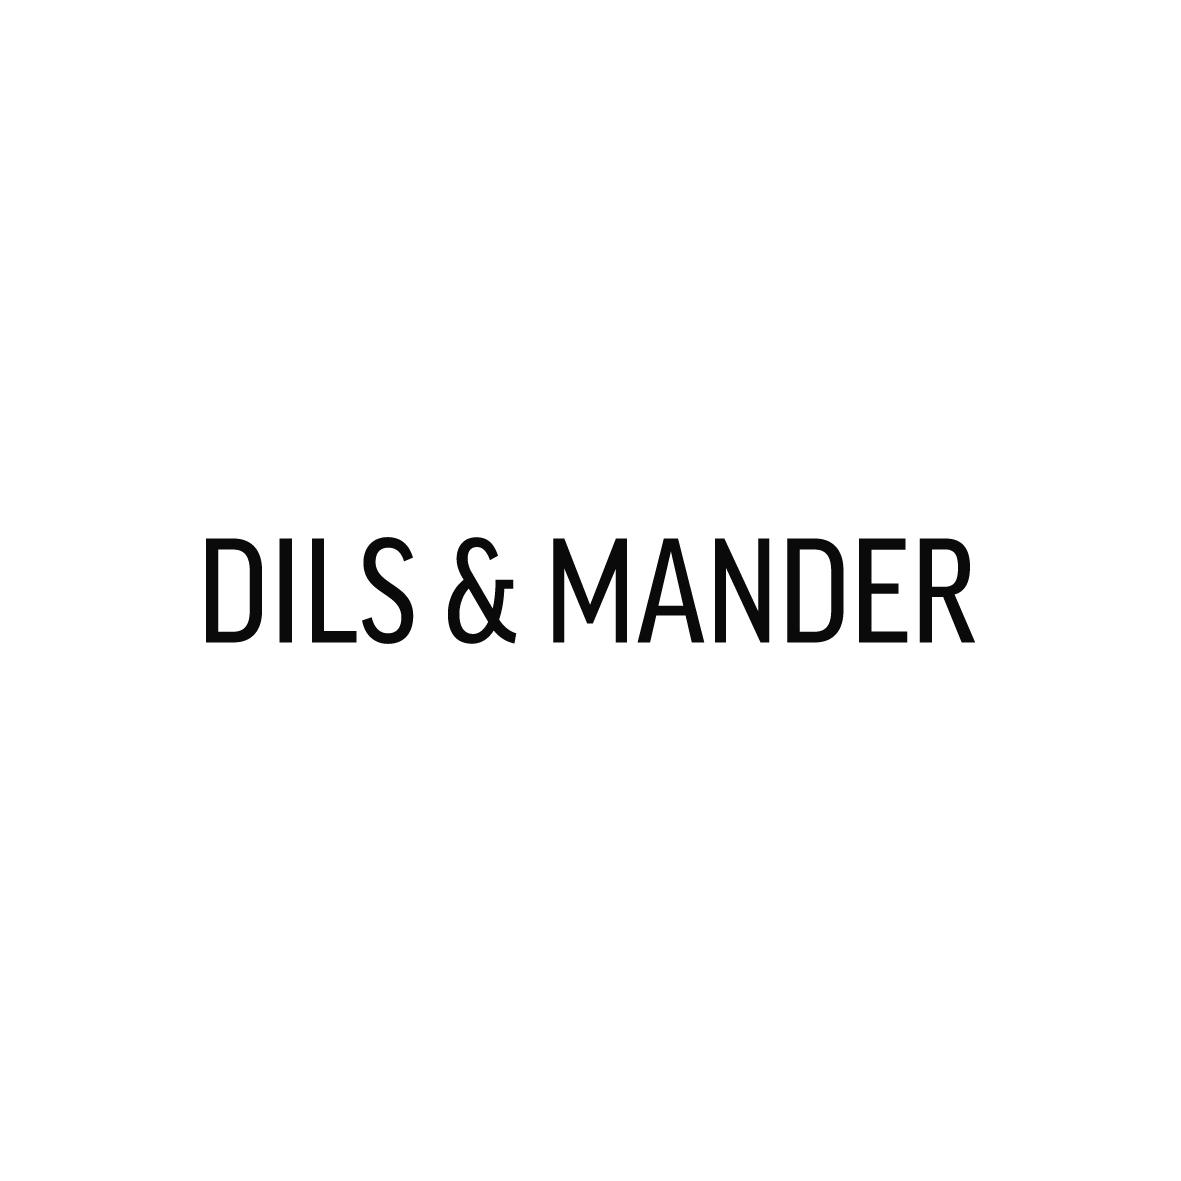 Dils & Mander